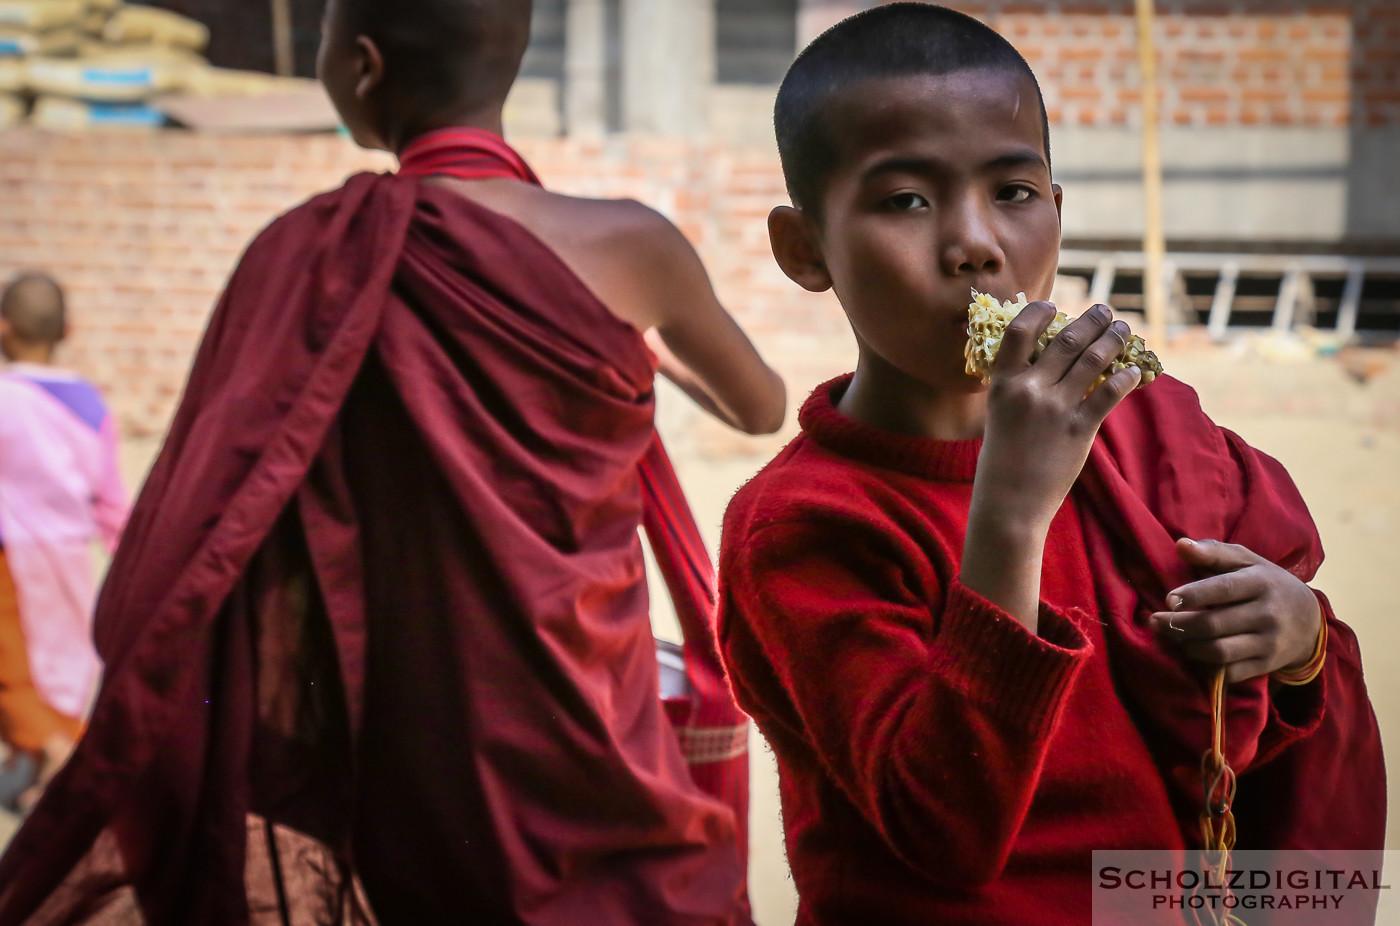 Birma, Buddha, Burma, Exploring, Monastery, Mönche, Myanmar, Nonnen, Travelling, Explorer, Scholzdigital